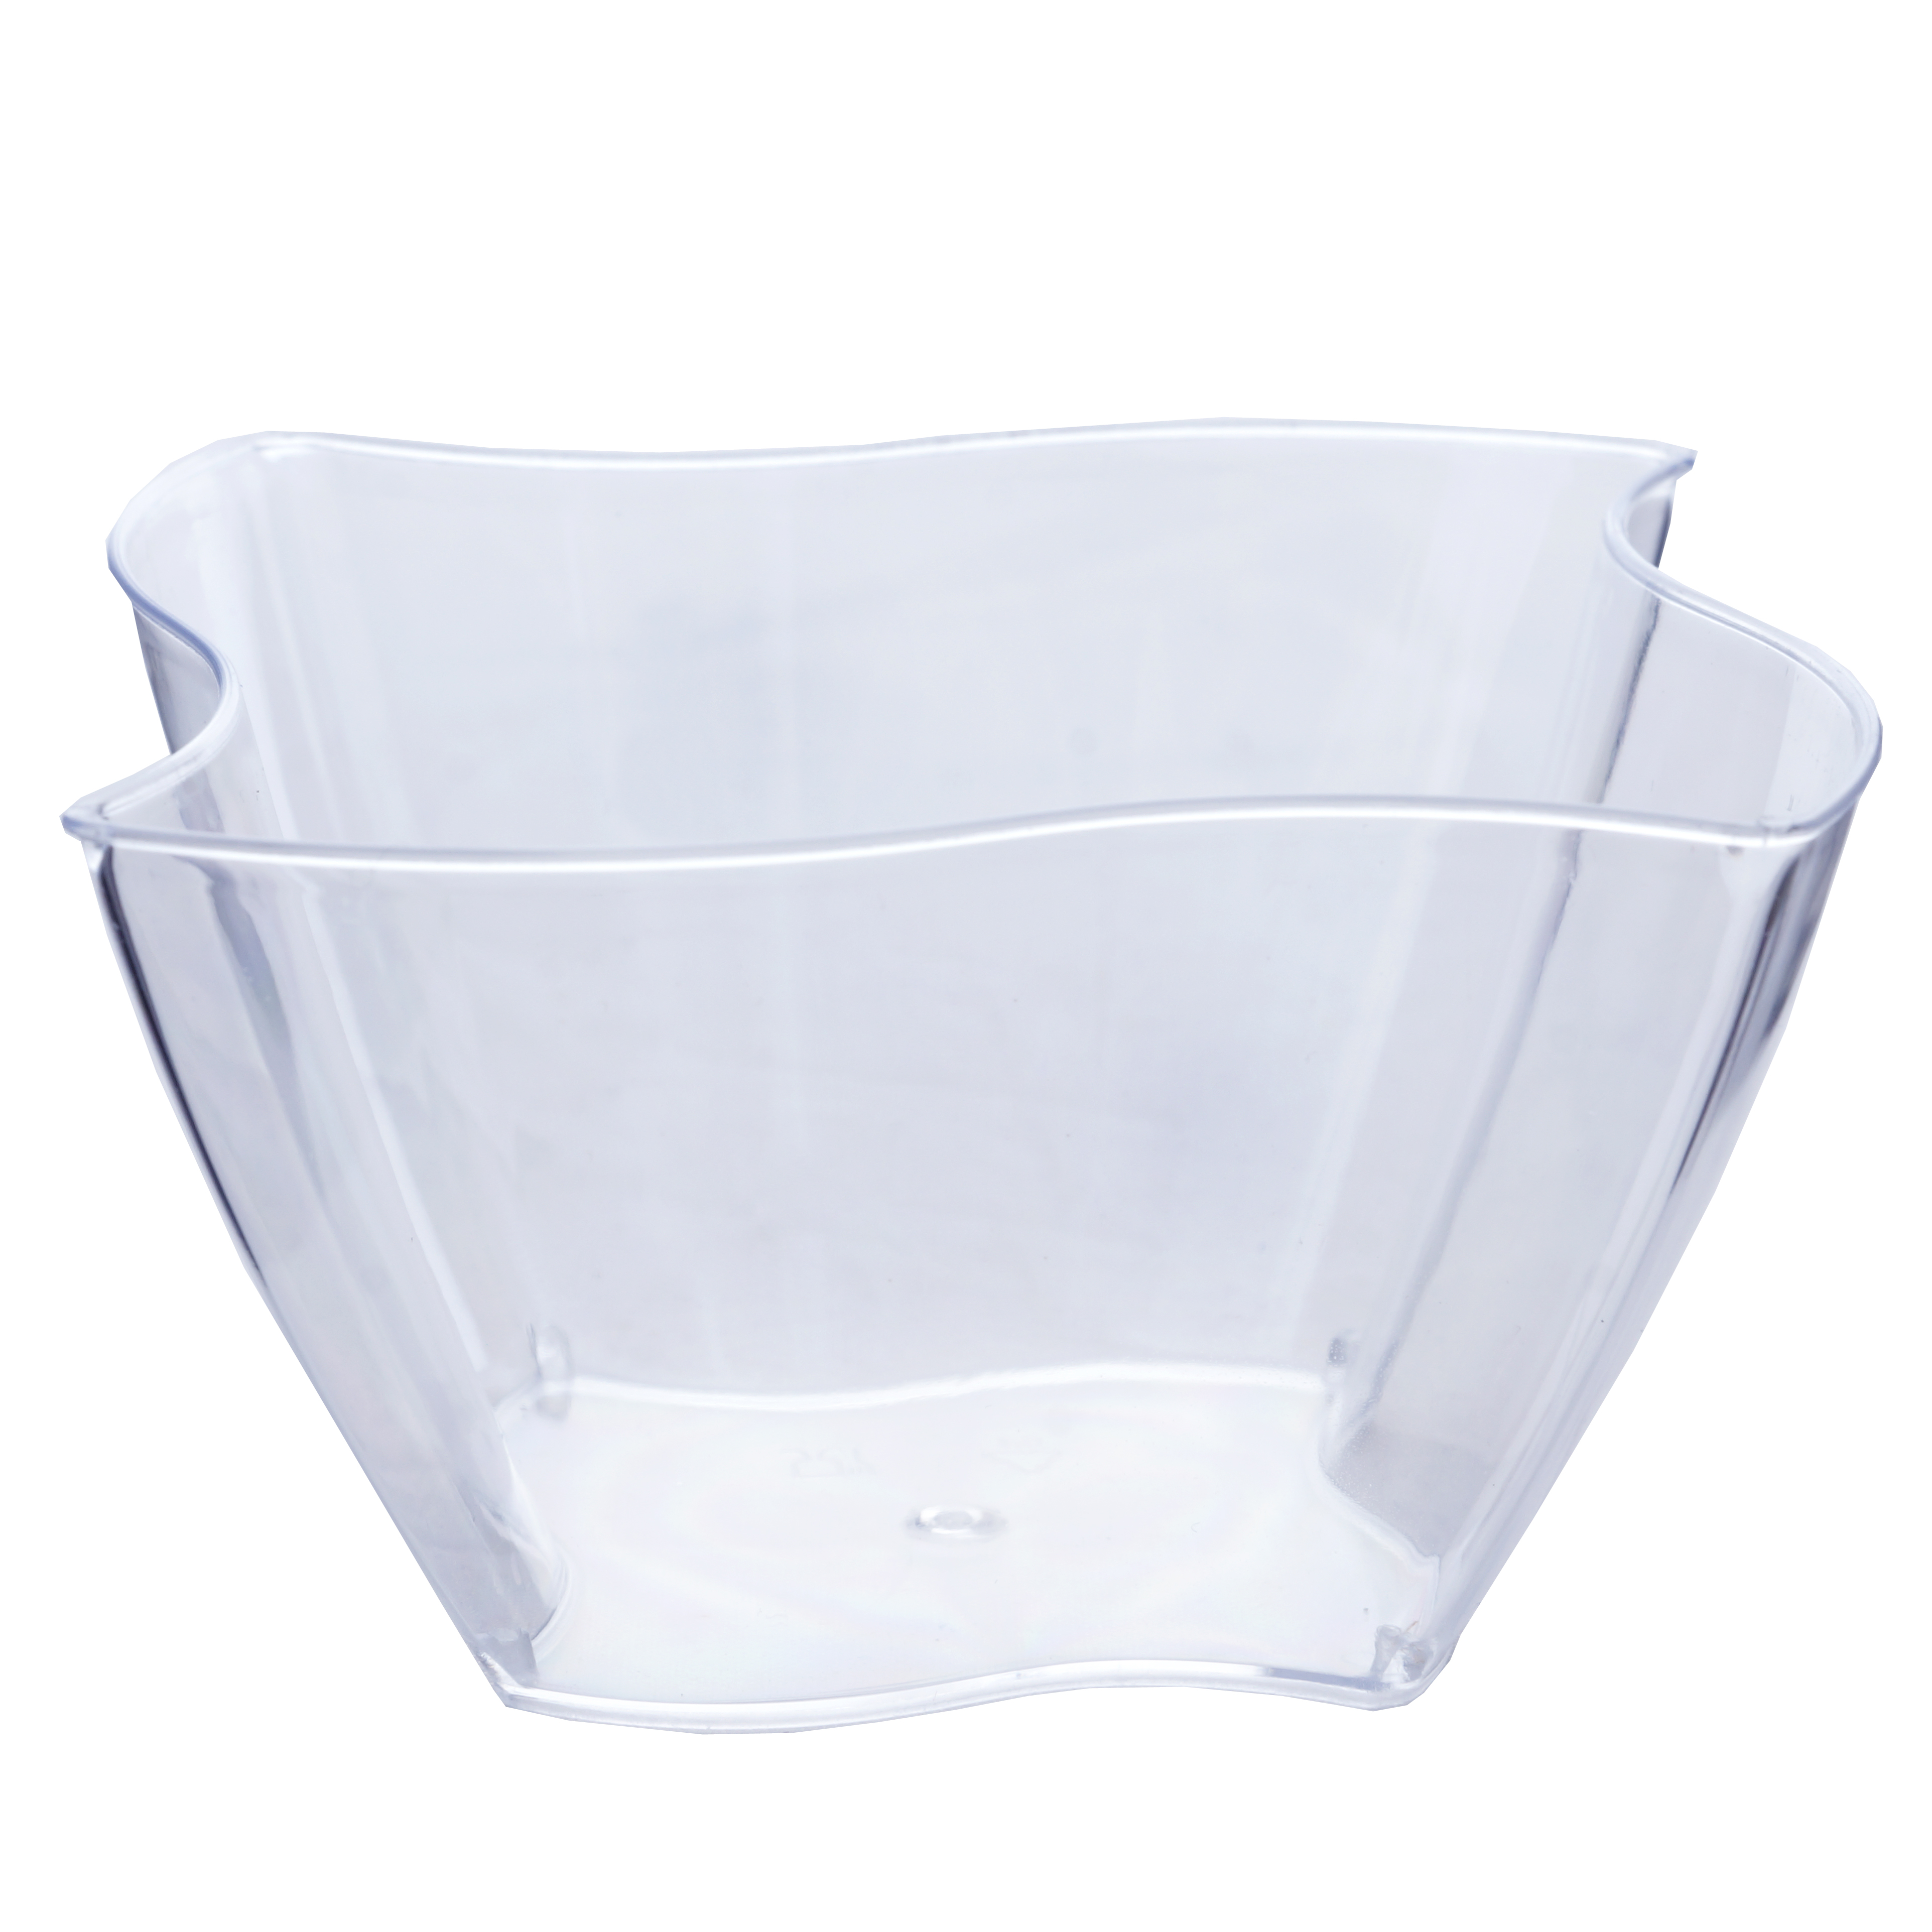 BalsaCircle 12 pcs 4 oz Disposable Square Waved Clear ...